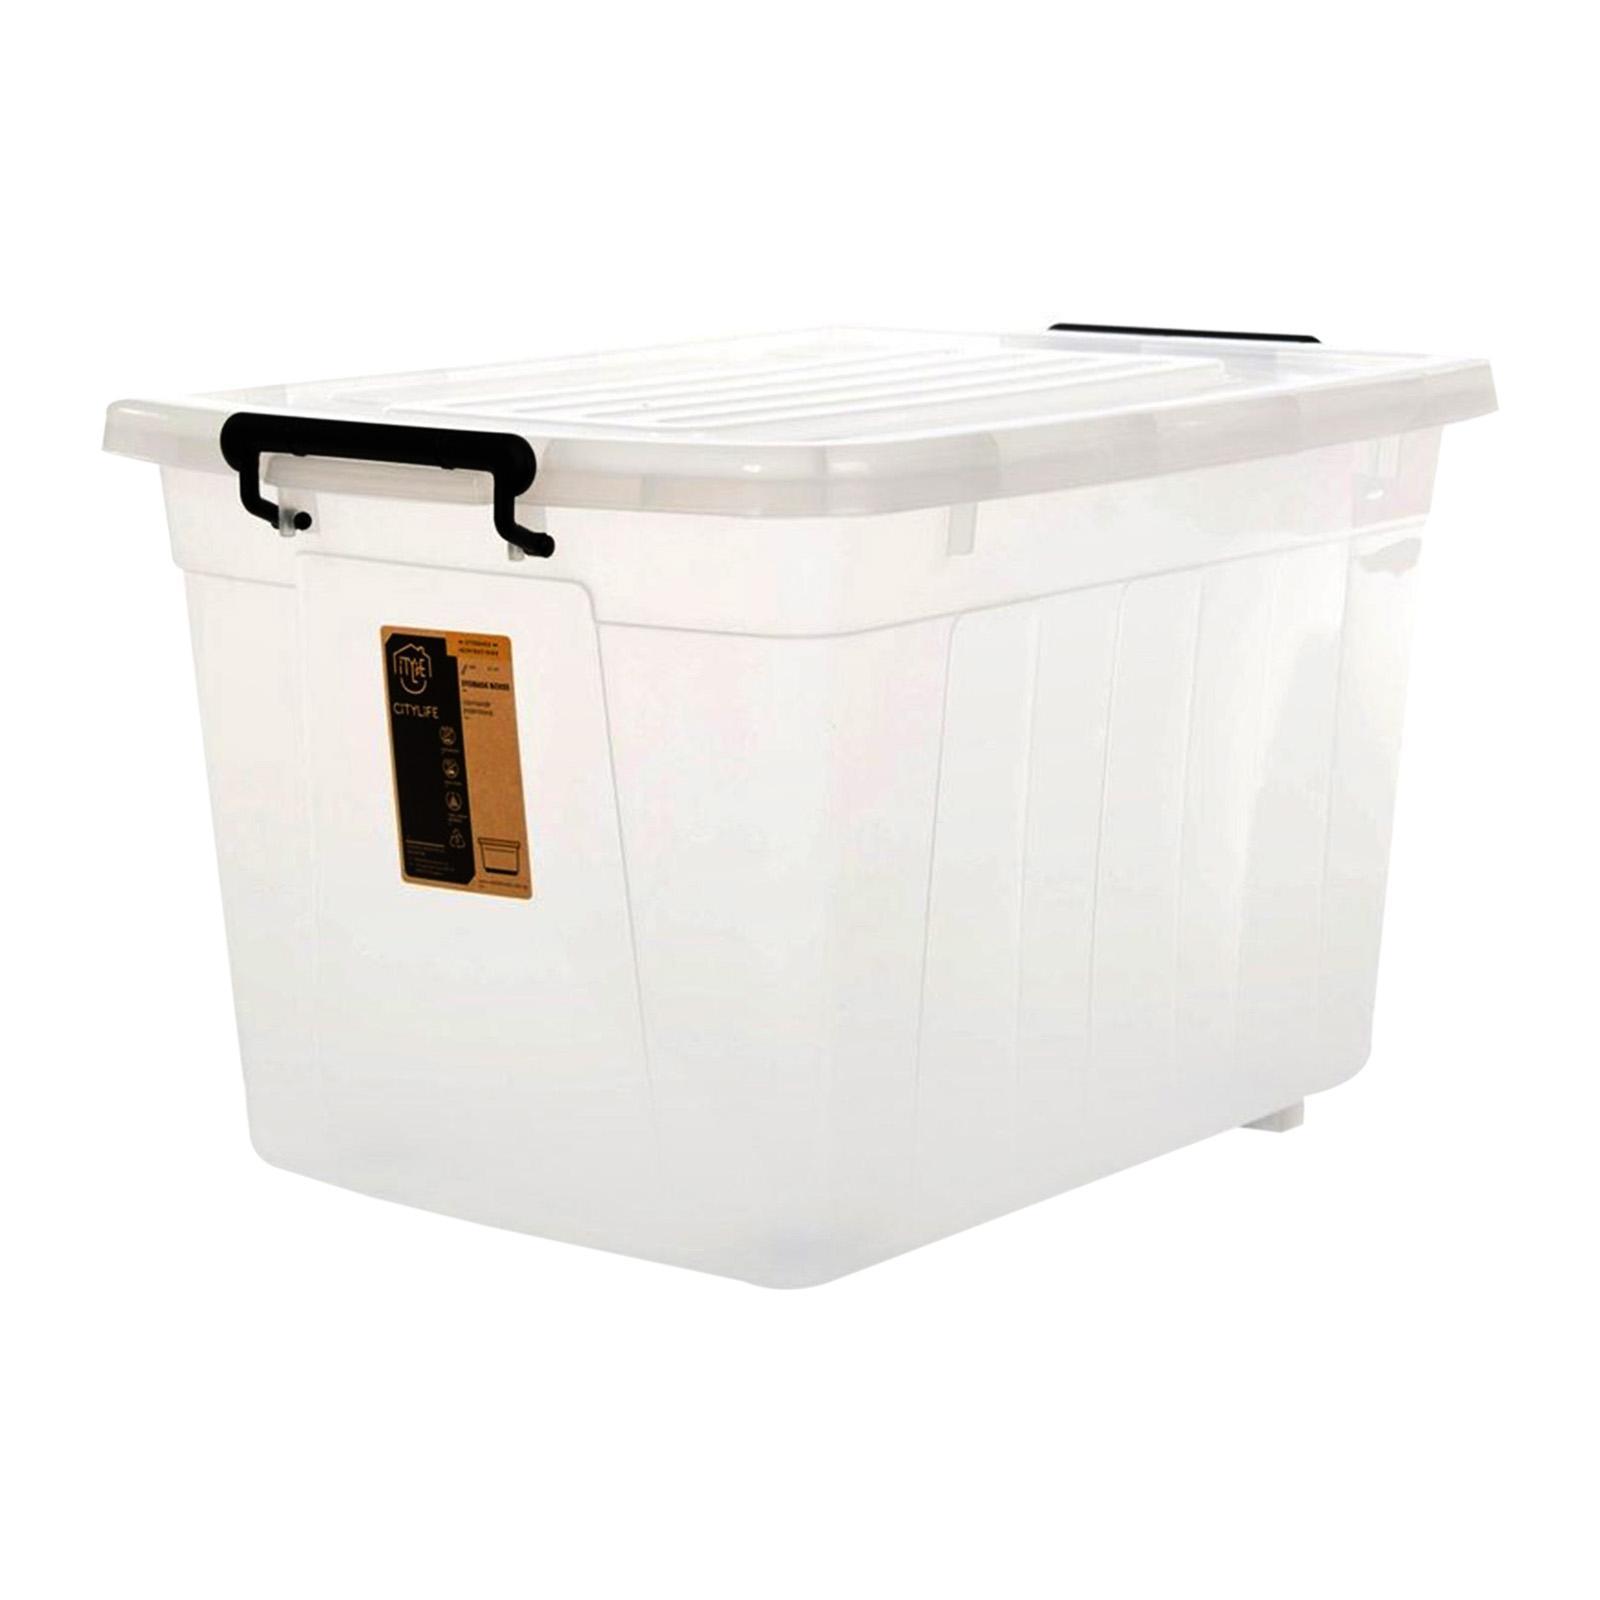 CITYLIFE Storage Box With Wheels